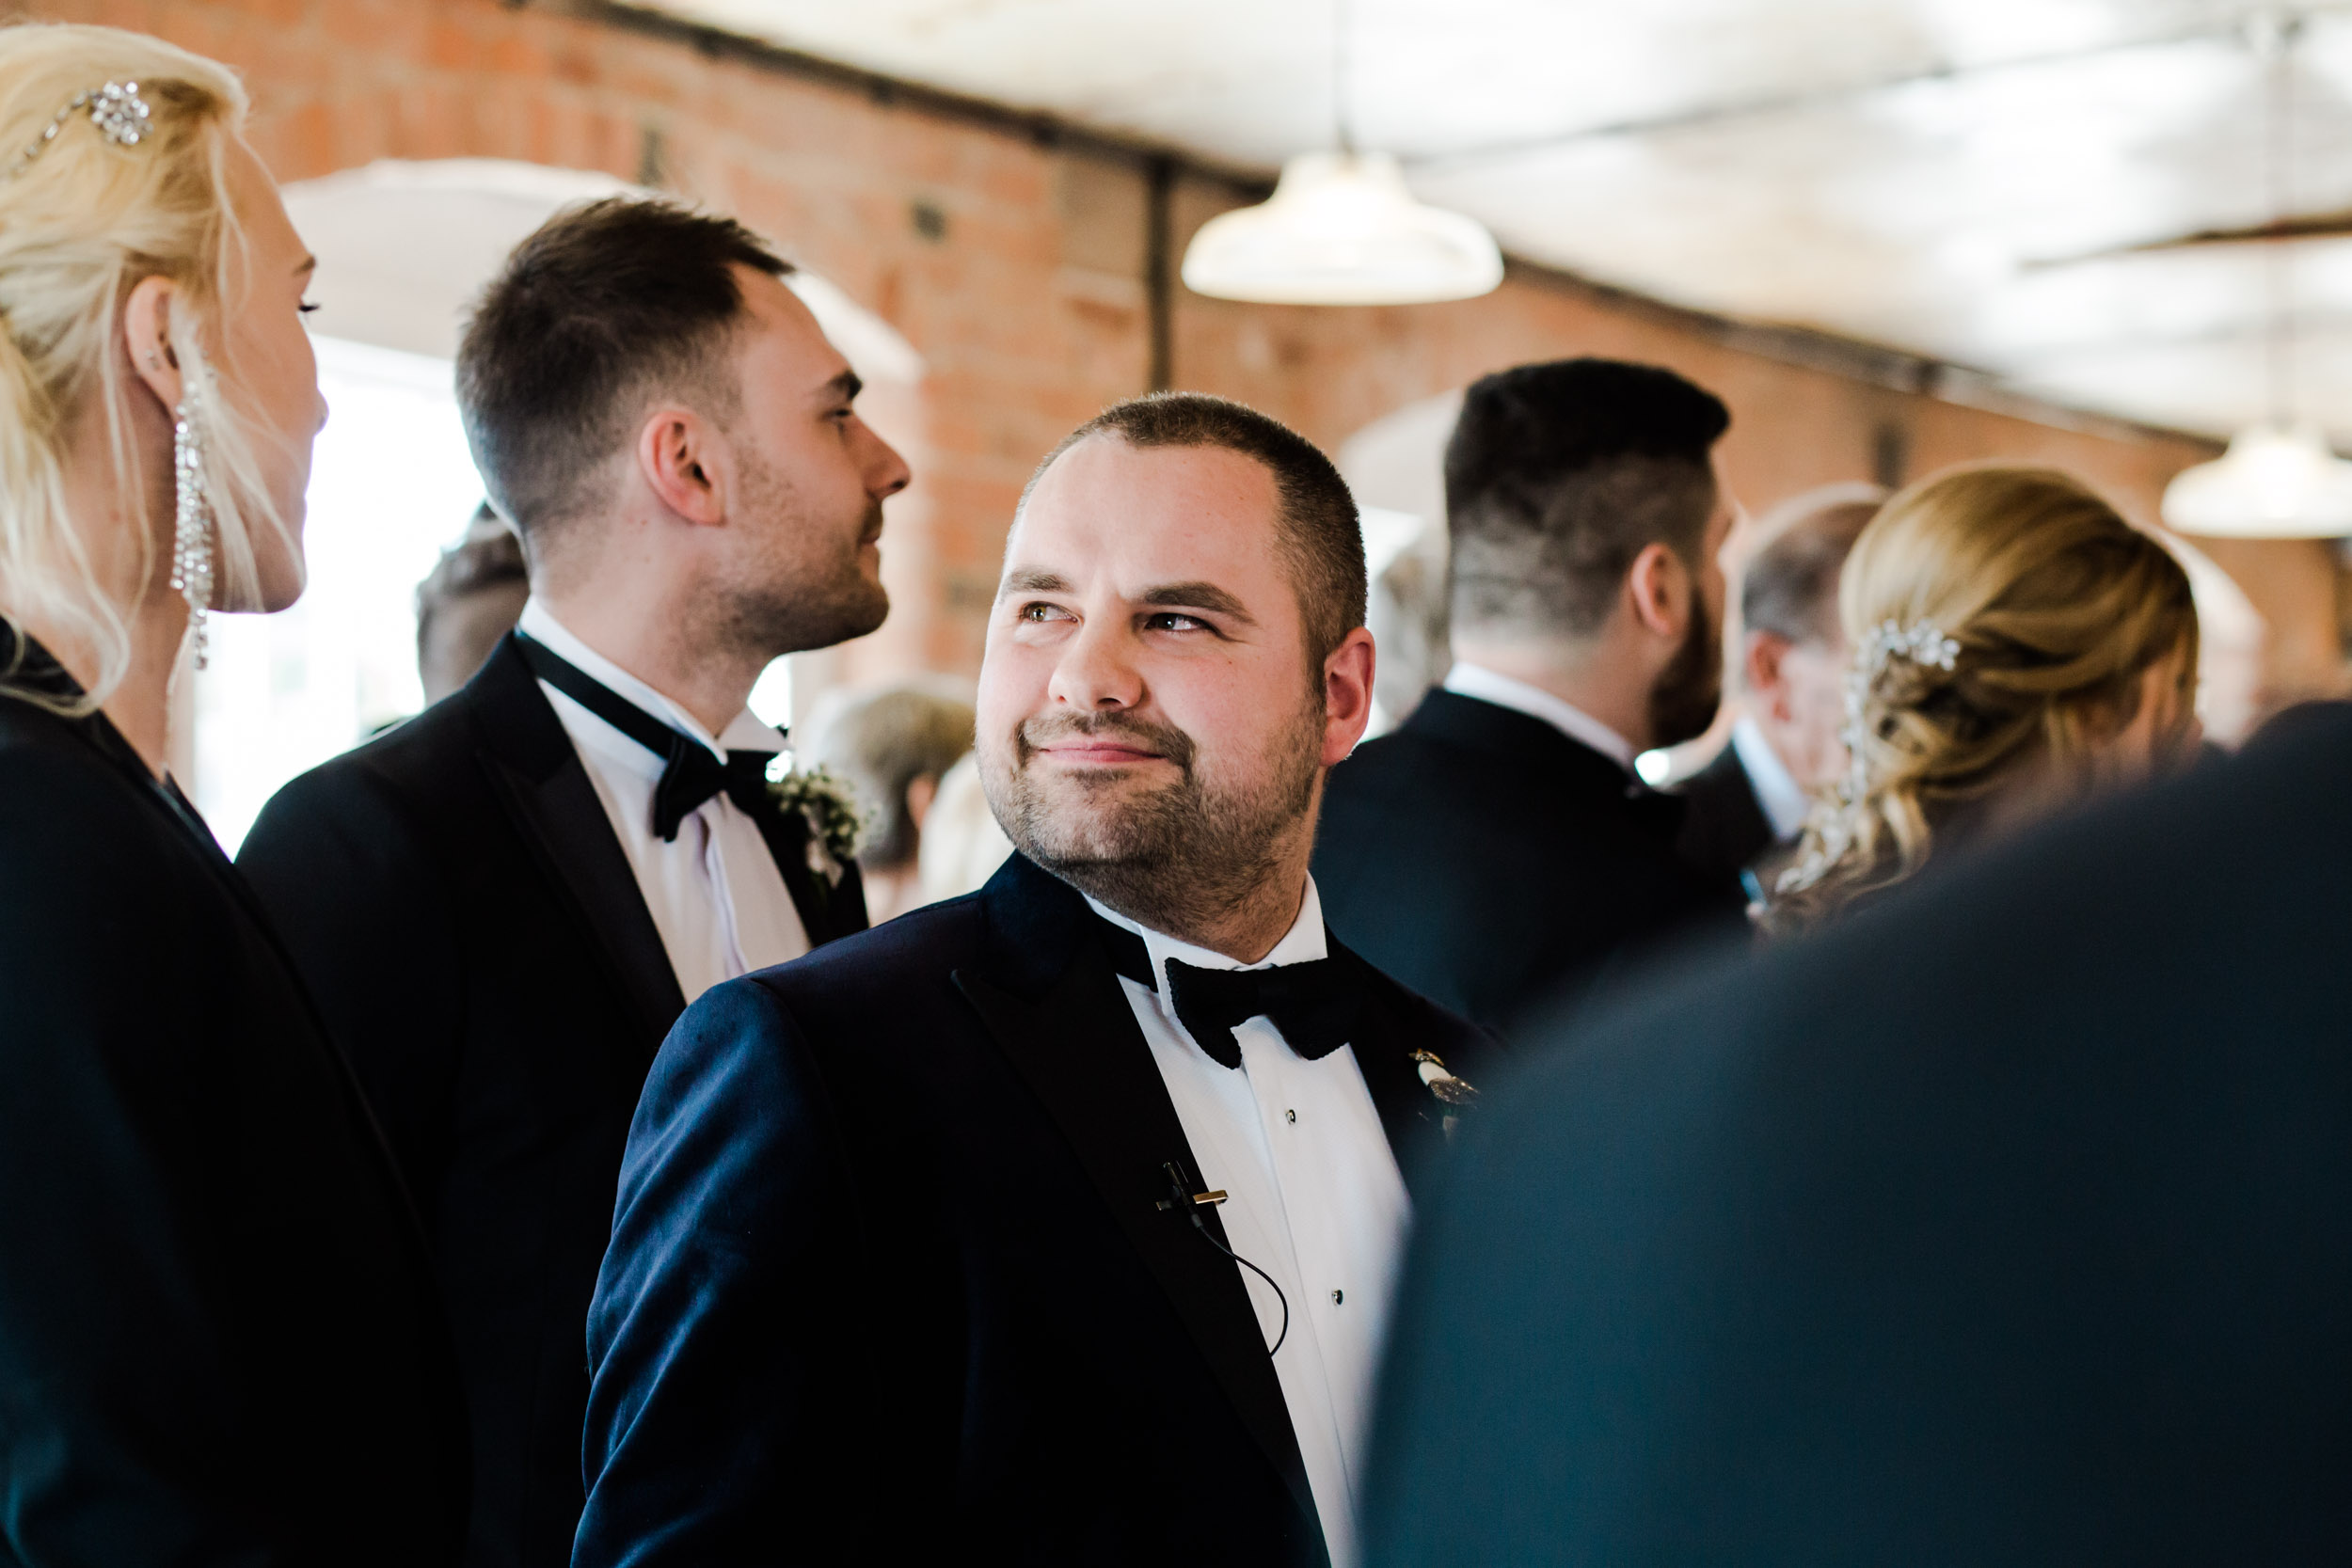 Industrial_glamour_wedding_west_mill_derby71